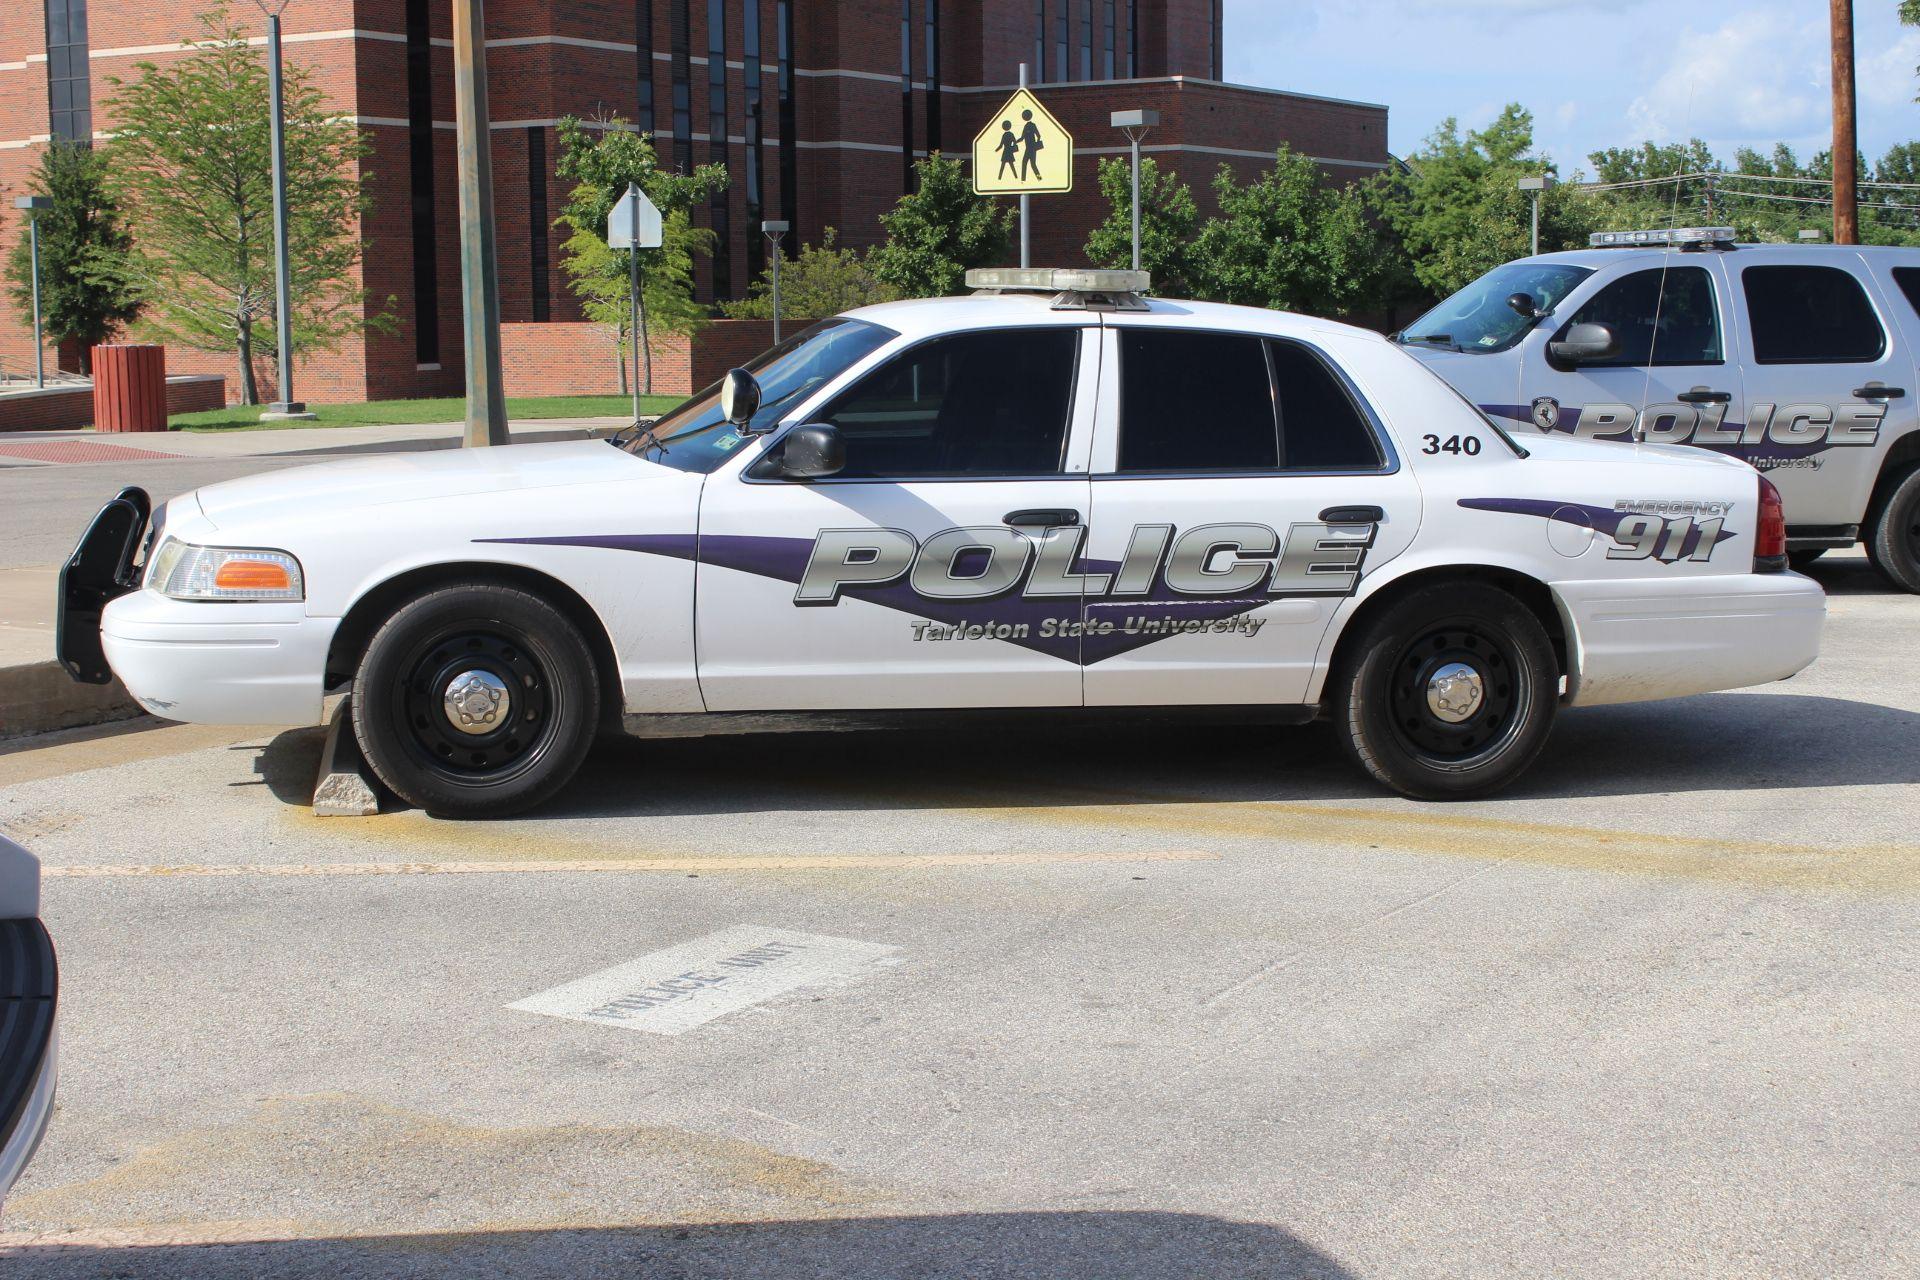 Tarleton State University Police